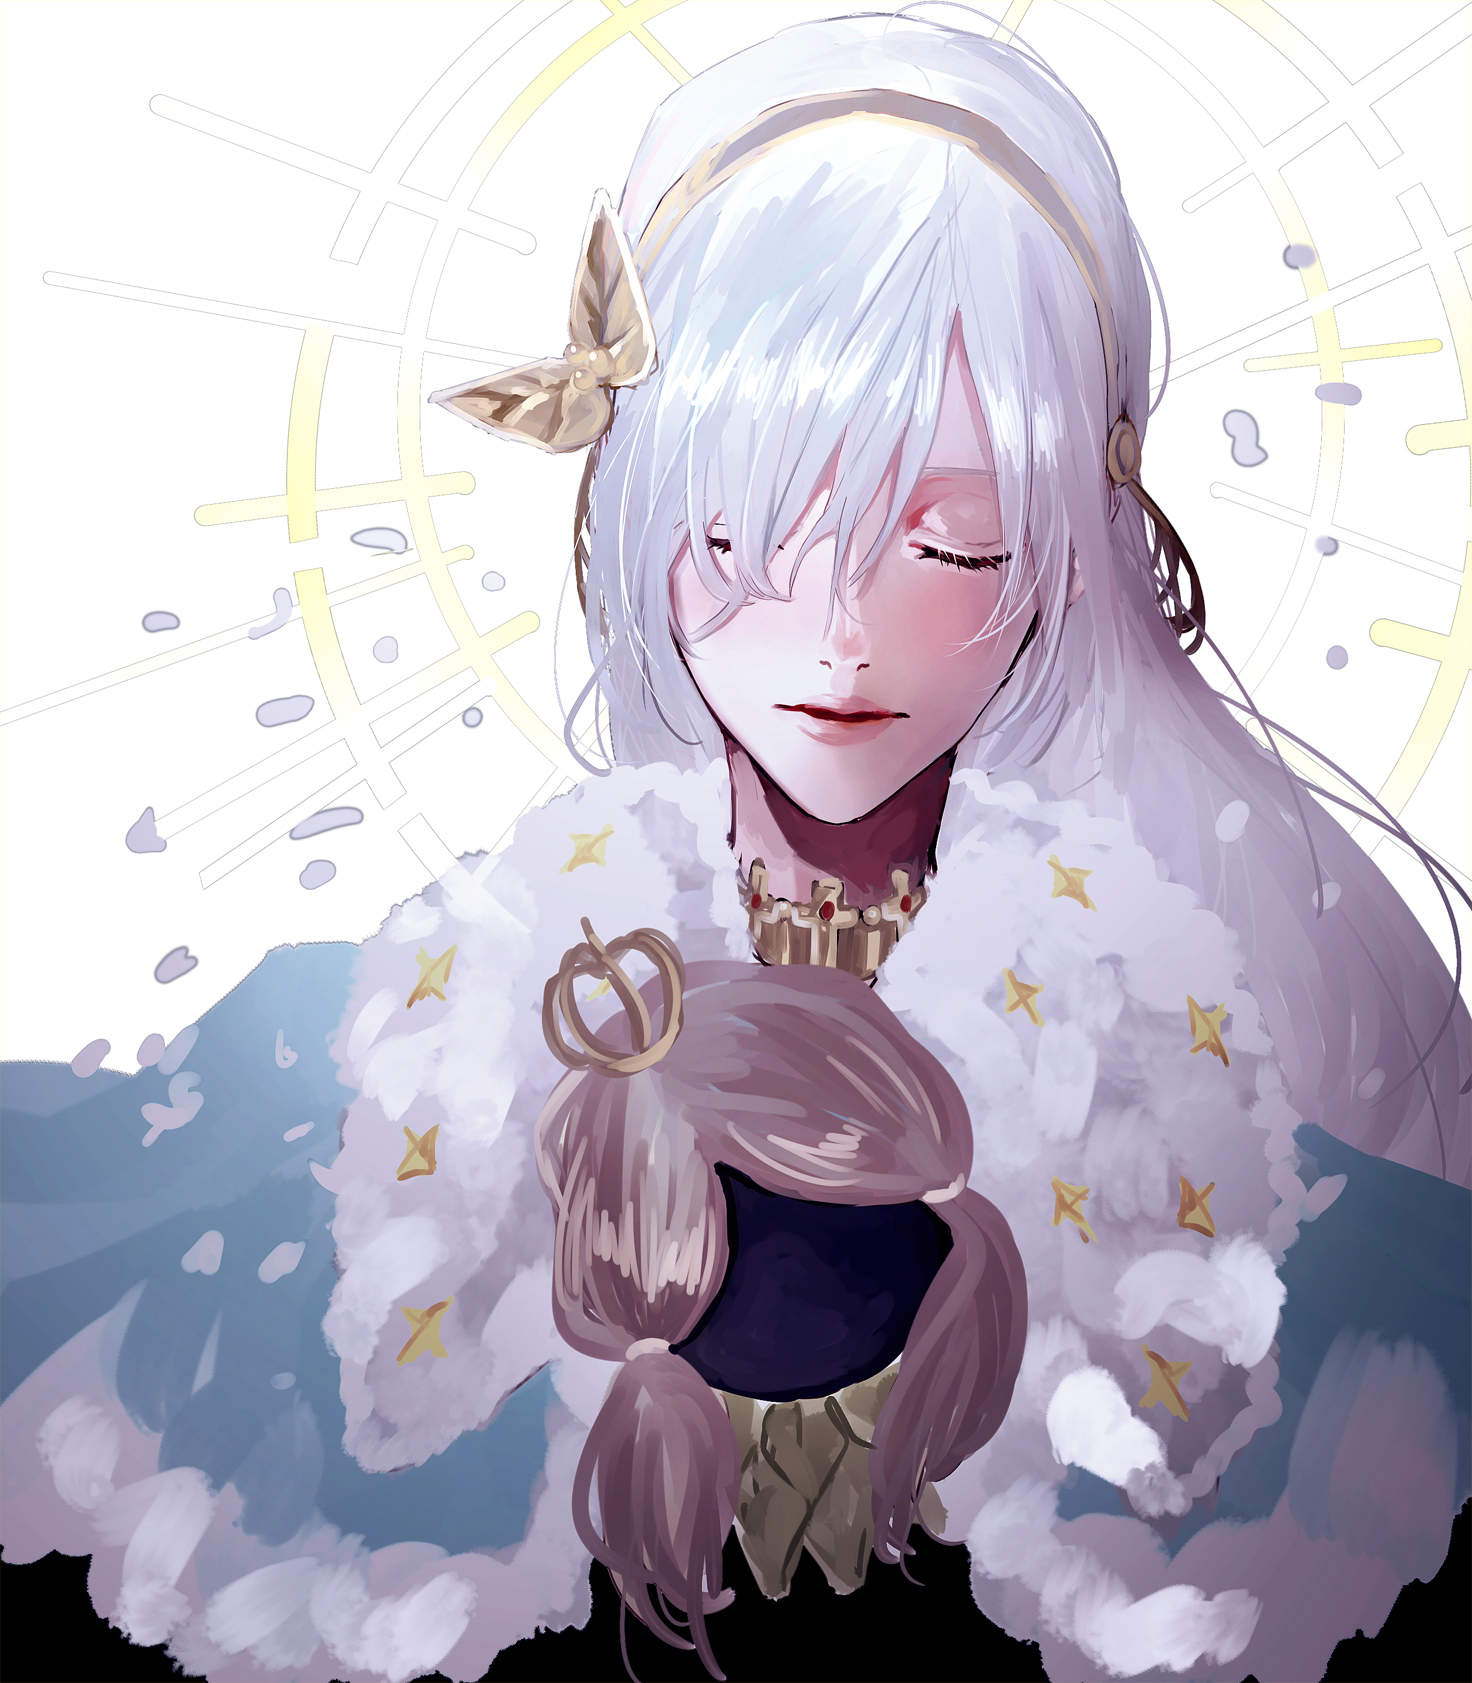 Caster Anastasia Nikolaevna Romanova Fate Grand Order Image 2244891 Zerochan Anime Image Board Lihat ide lainnya tentang seni anime, animasi, seni. caster anastasia nikolaevna romanova